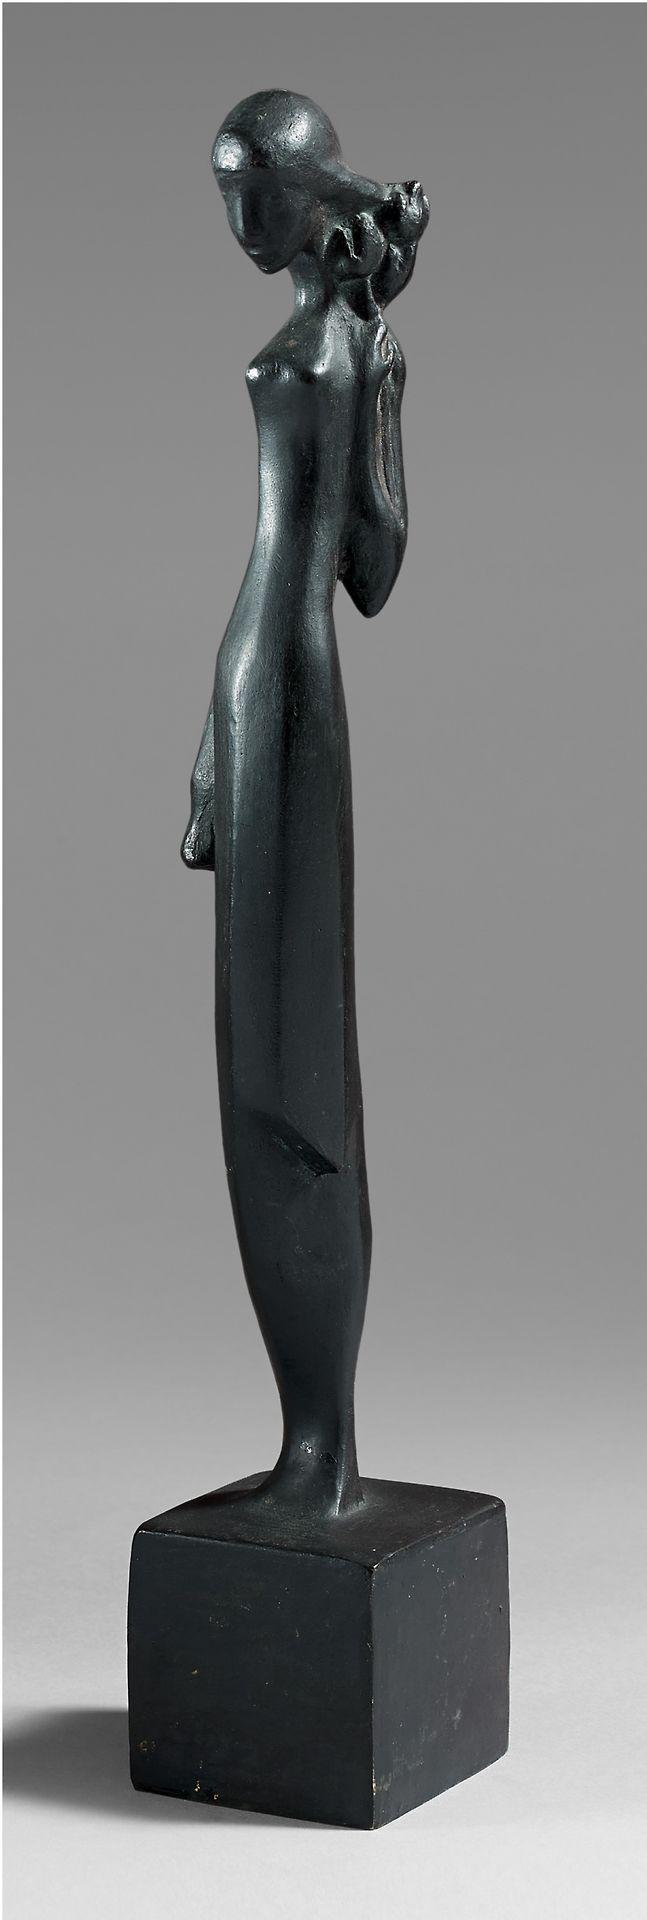 Joseph Csaky (1888-1971) - Jeune fille, 1964